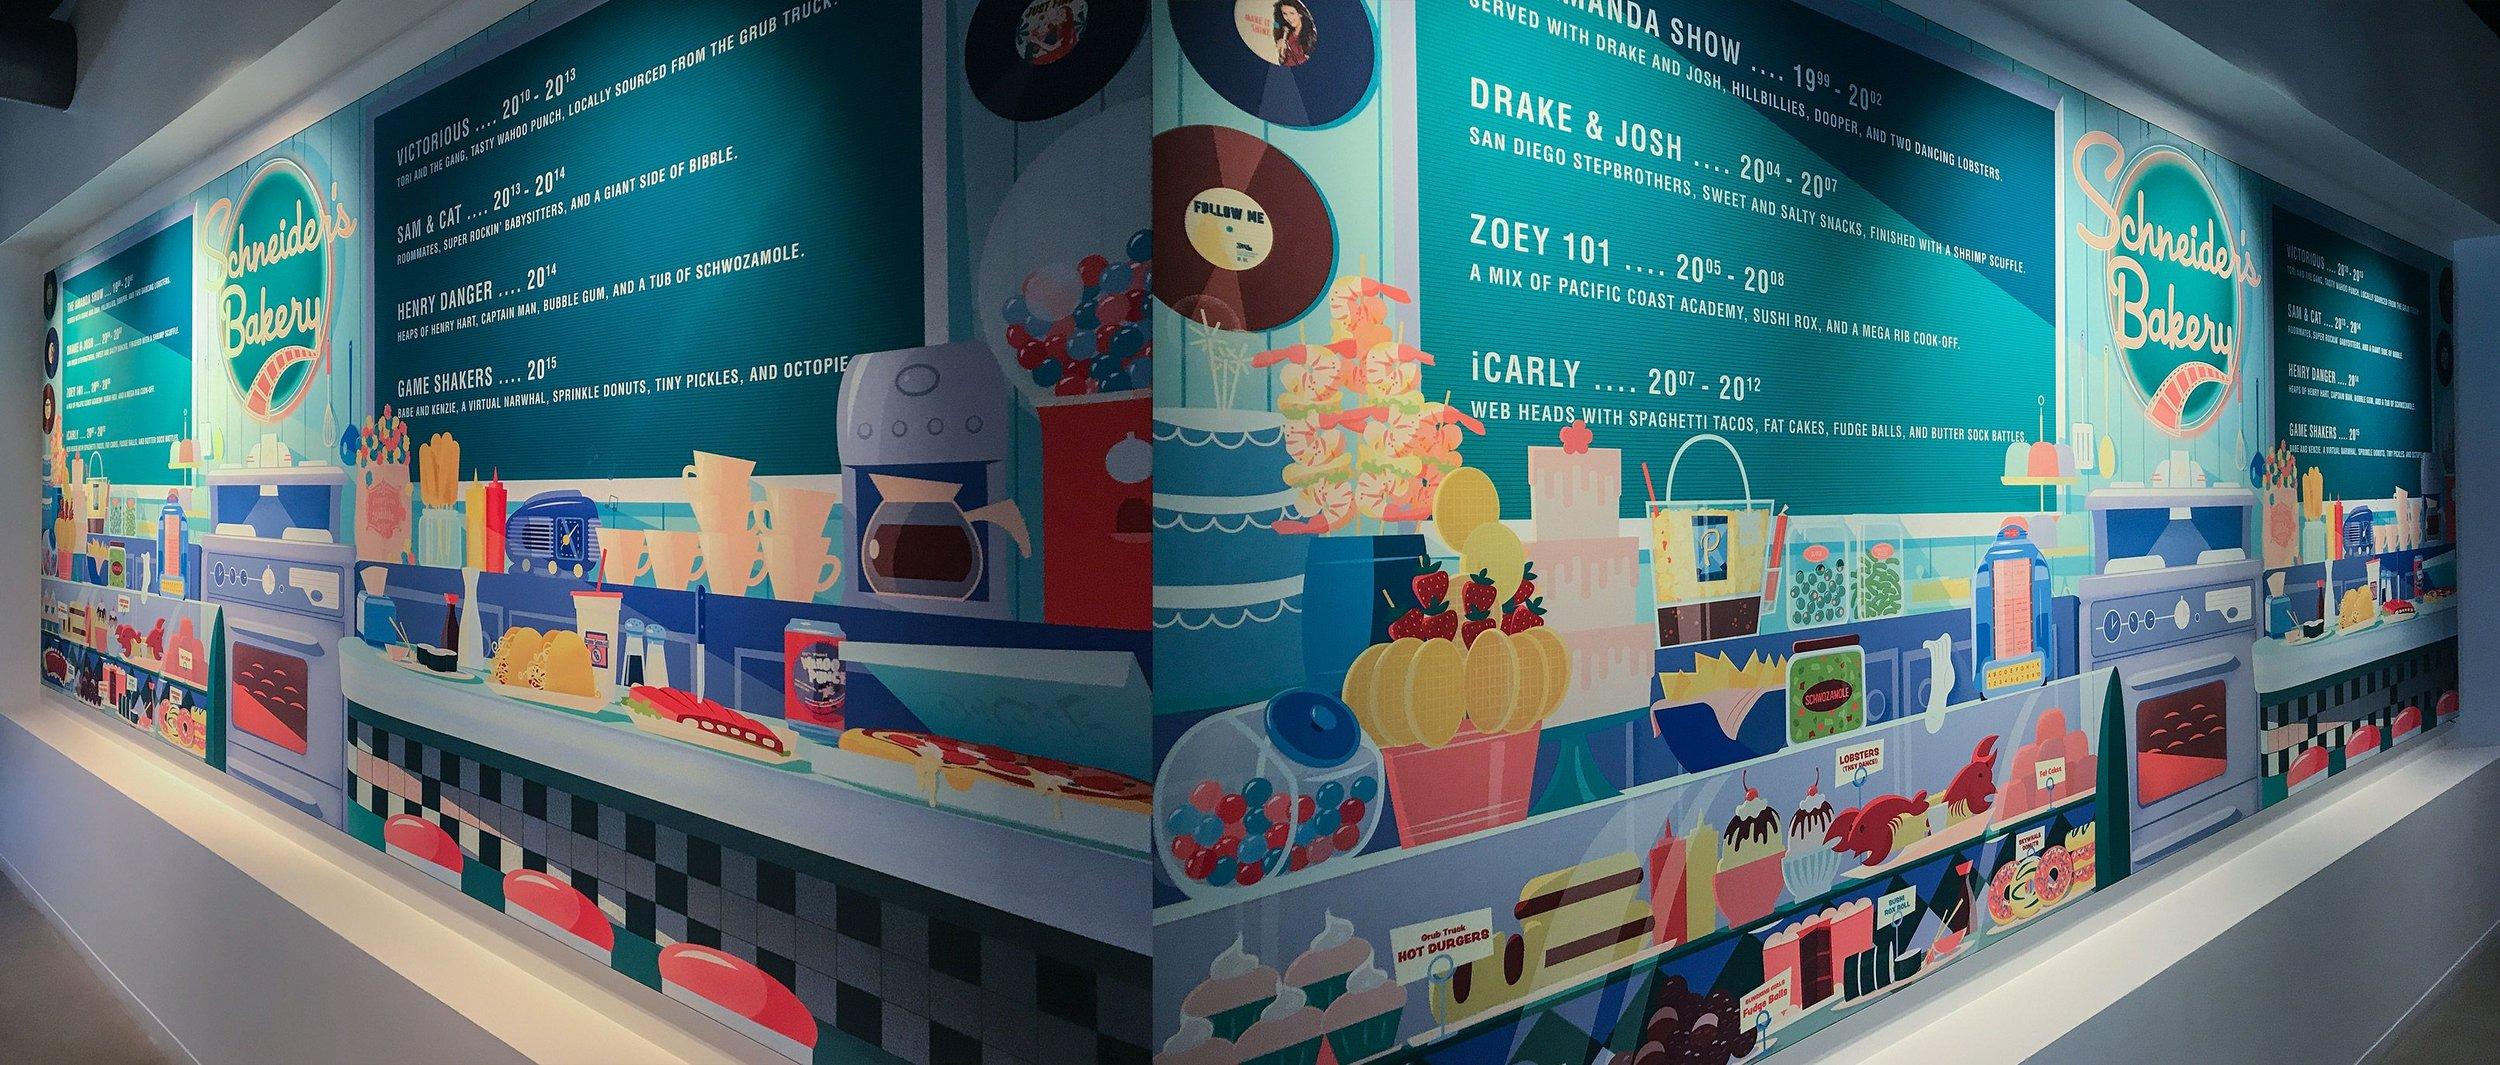 Schneider's Bakery Wall